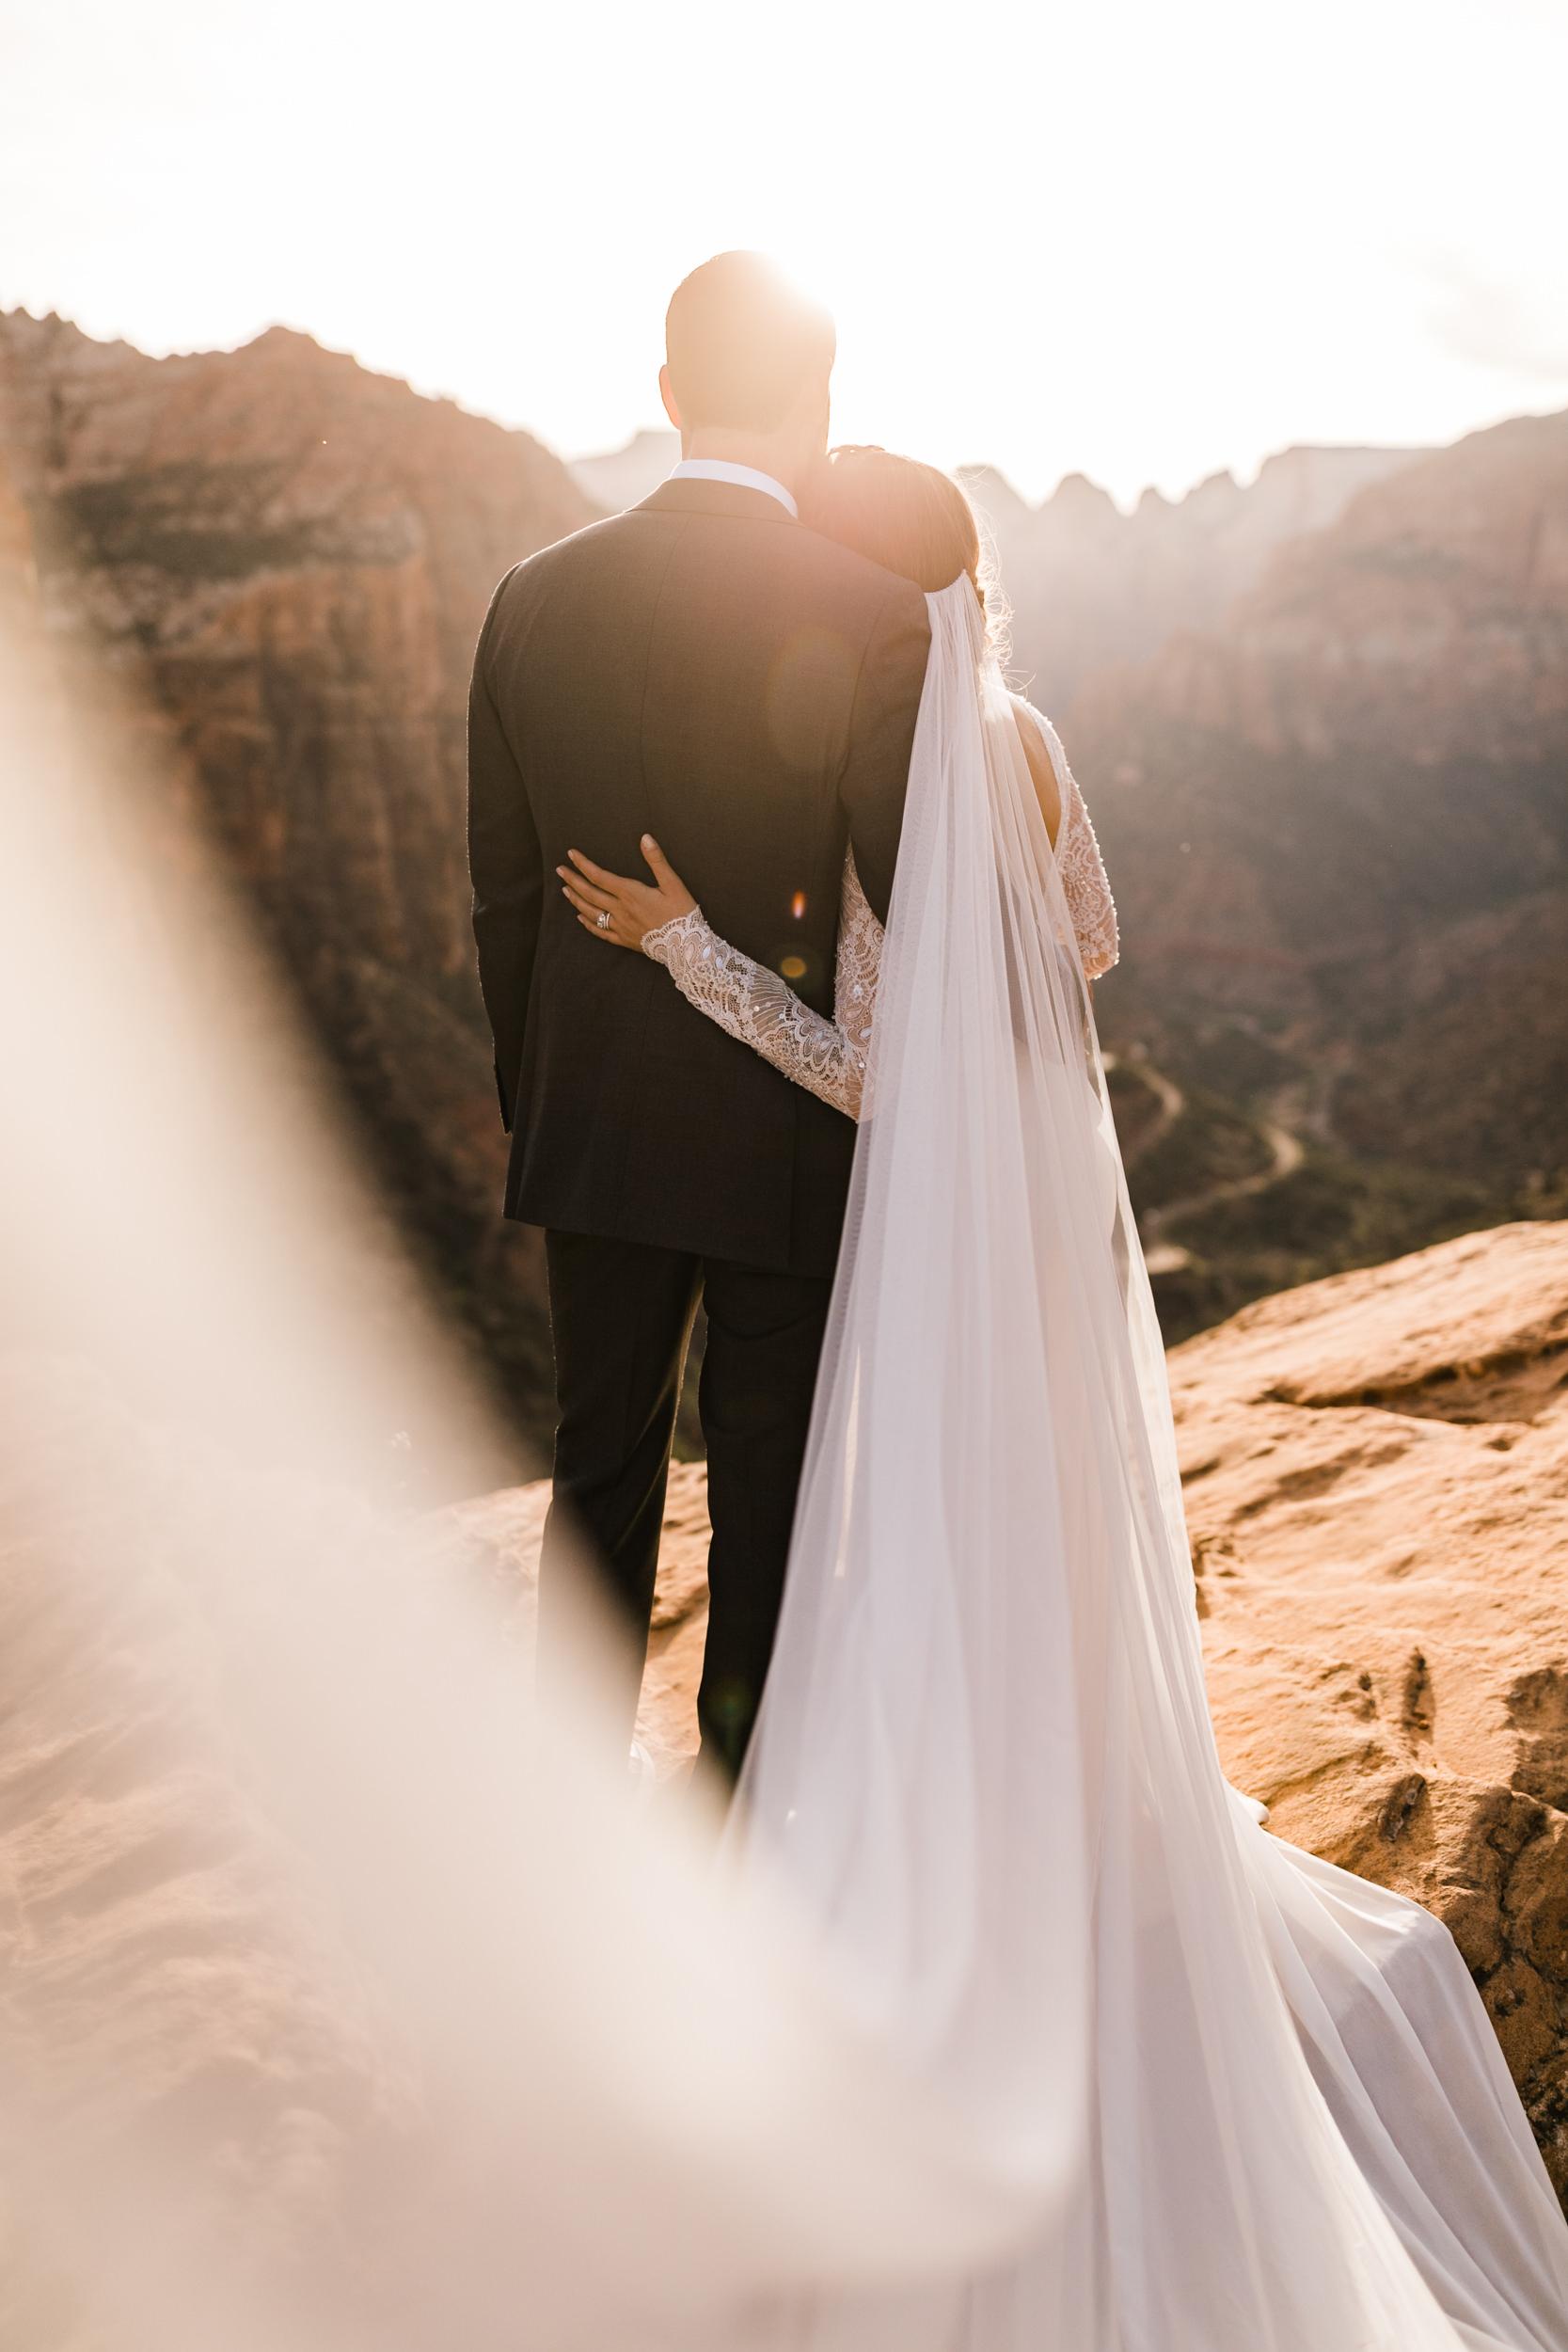 Zion-National-Park-Adventure-Wedding-Hearnes-Elopement-Photography-38.jpg